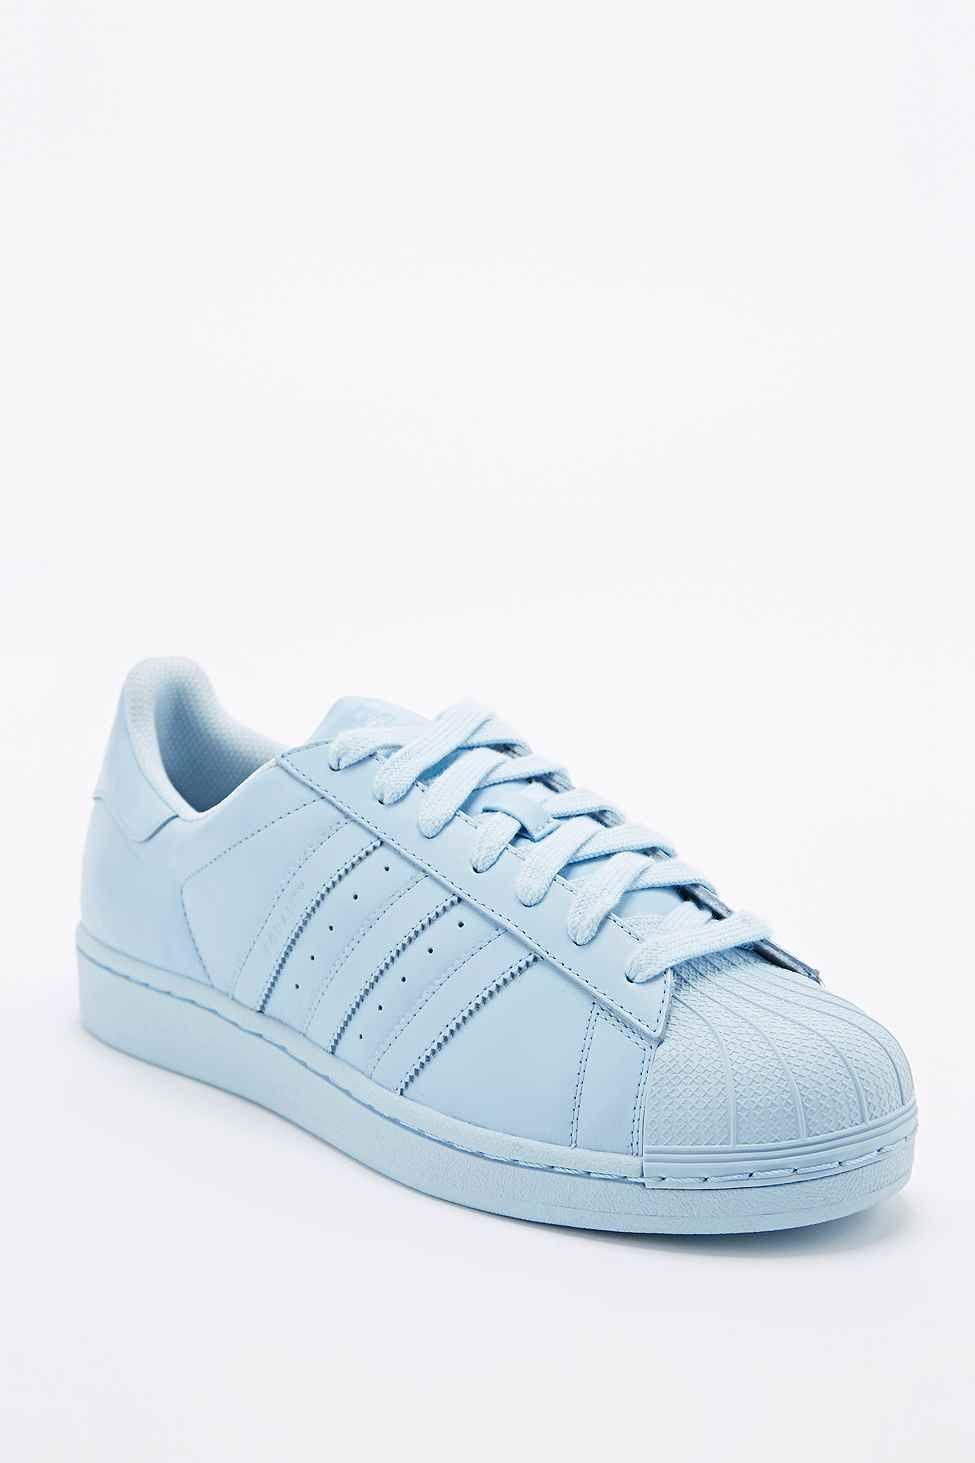 Adidas X Pharrell Sneaker Supercolor Superstar In Blau Adidas Supercolor Die Neuen Coolen Adidas Superstars By Phar Adidas Superstar Sneaker Turnschuhe